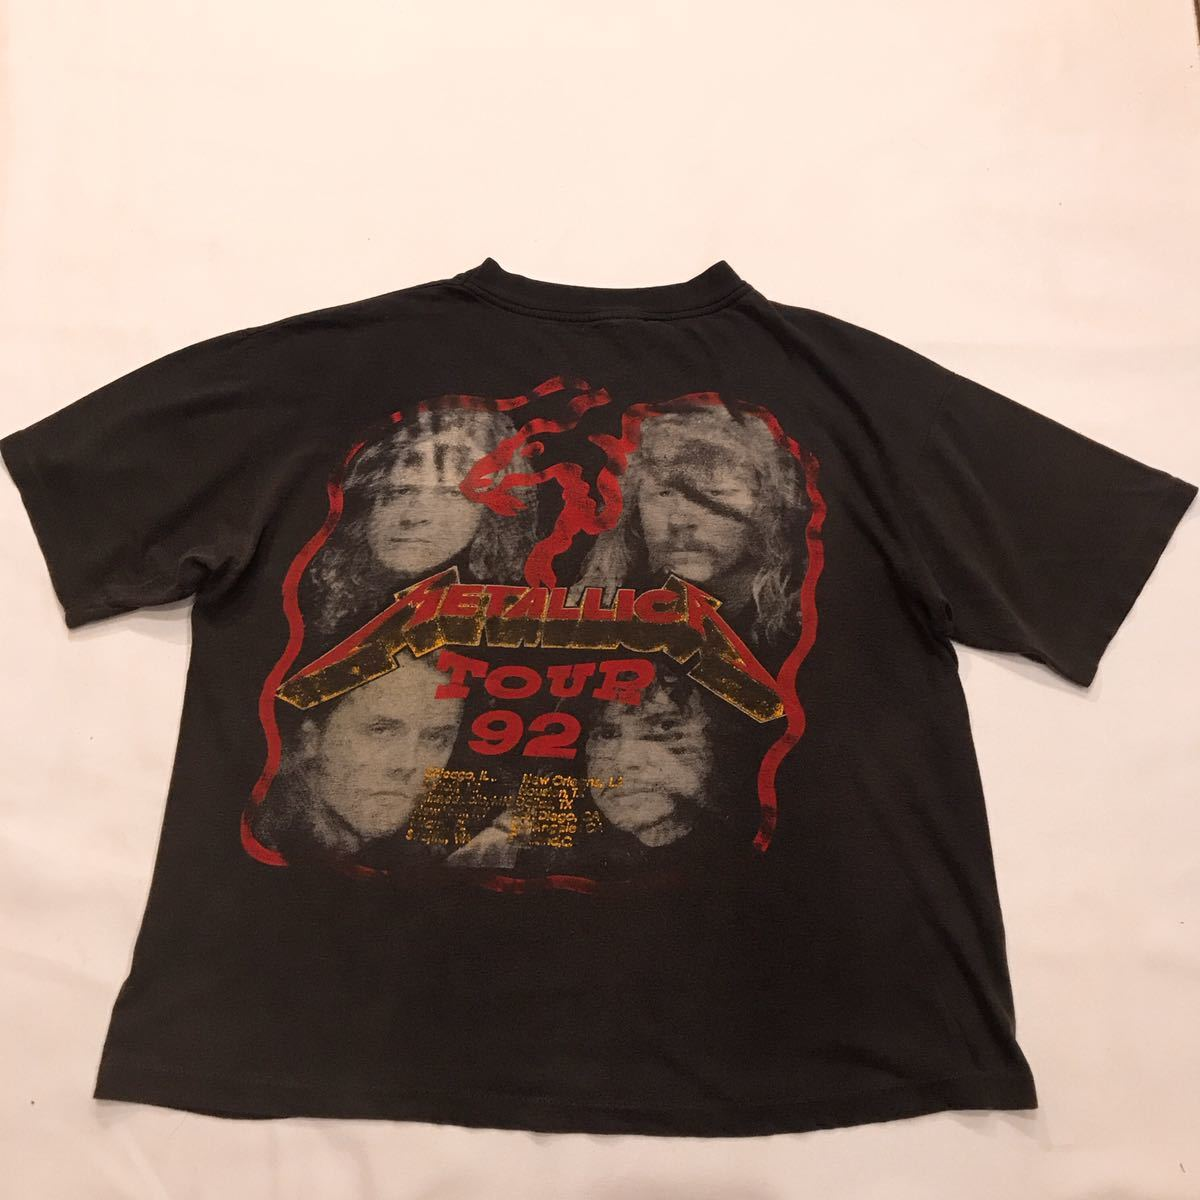 90s 90年代 GUNS N ROSES METALLICA ガンズアンドローゼズ メタリカ バンドT ロックT ツアーT VINTAGE ビンテージ 1992 Stadium Tour XL_画像5